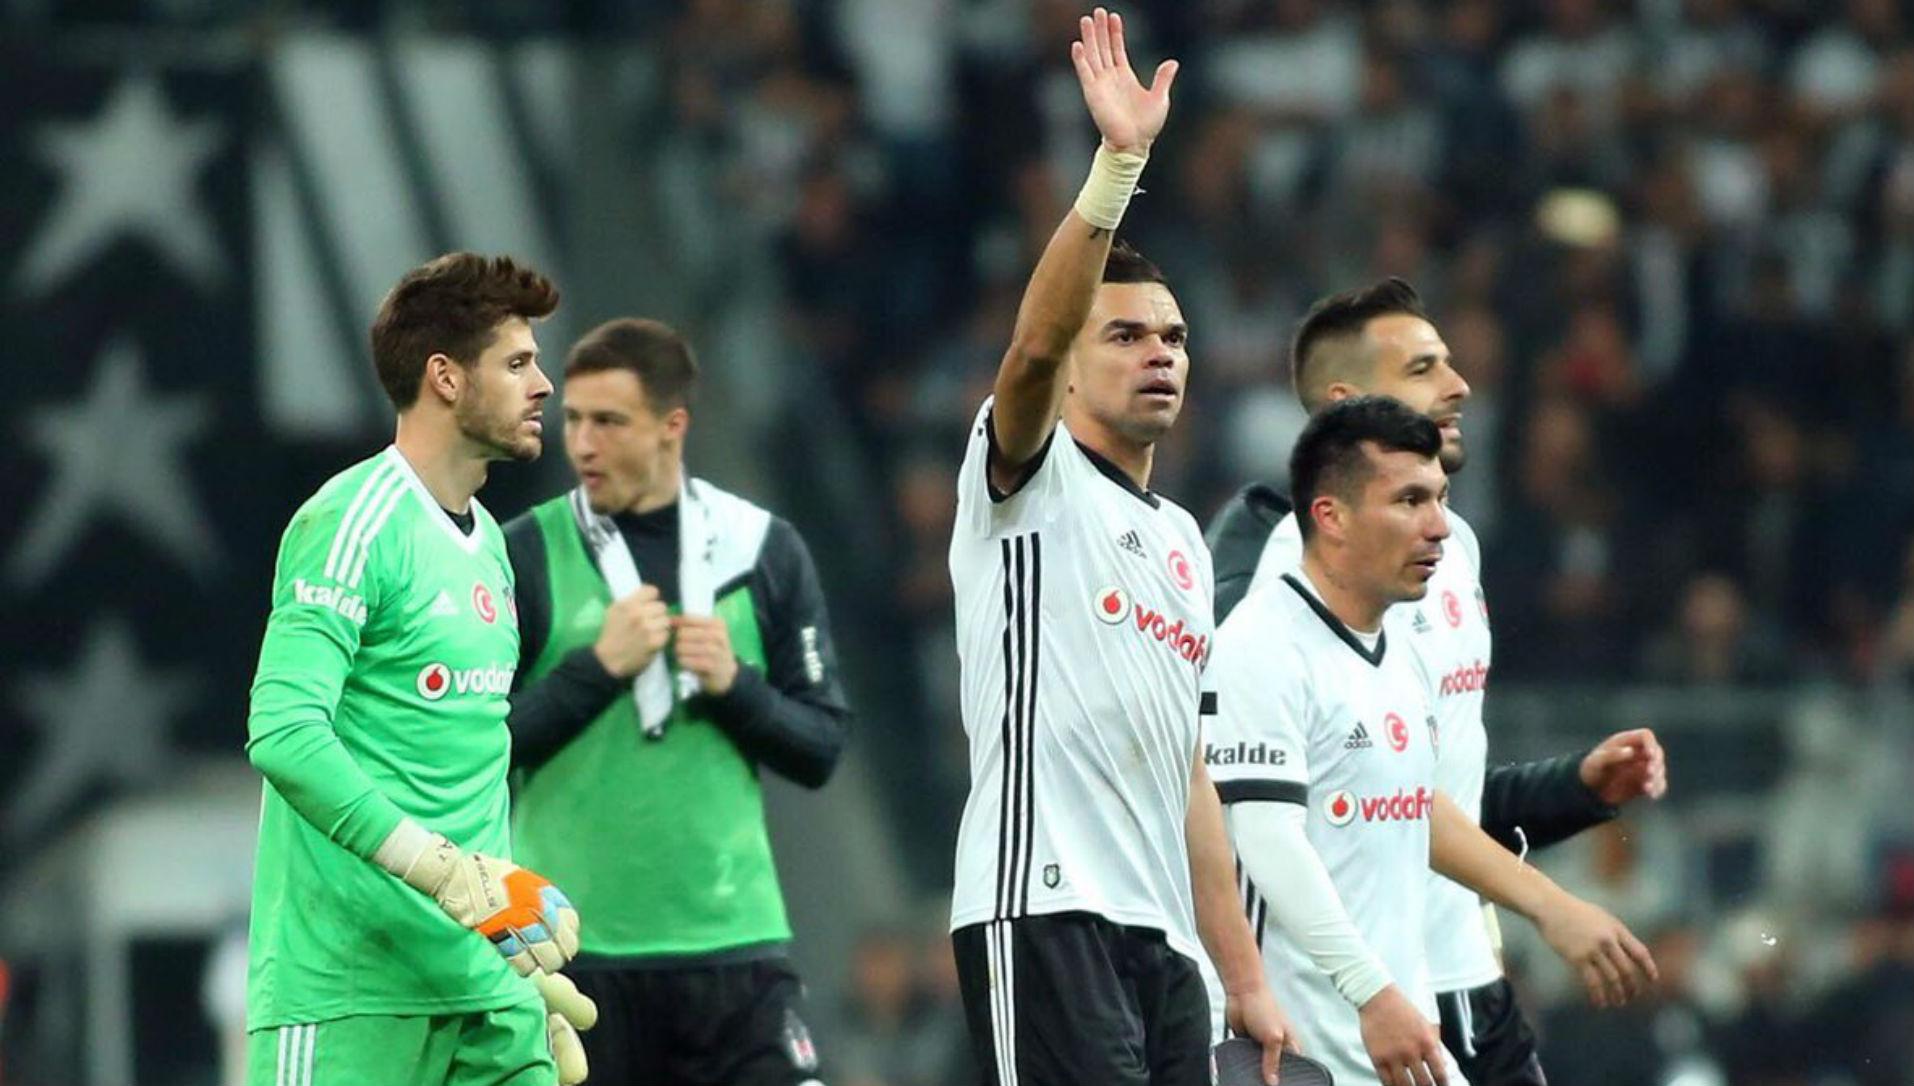 021217 Besiktas Galatasaray Gary Medel Pepe